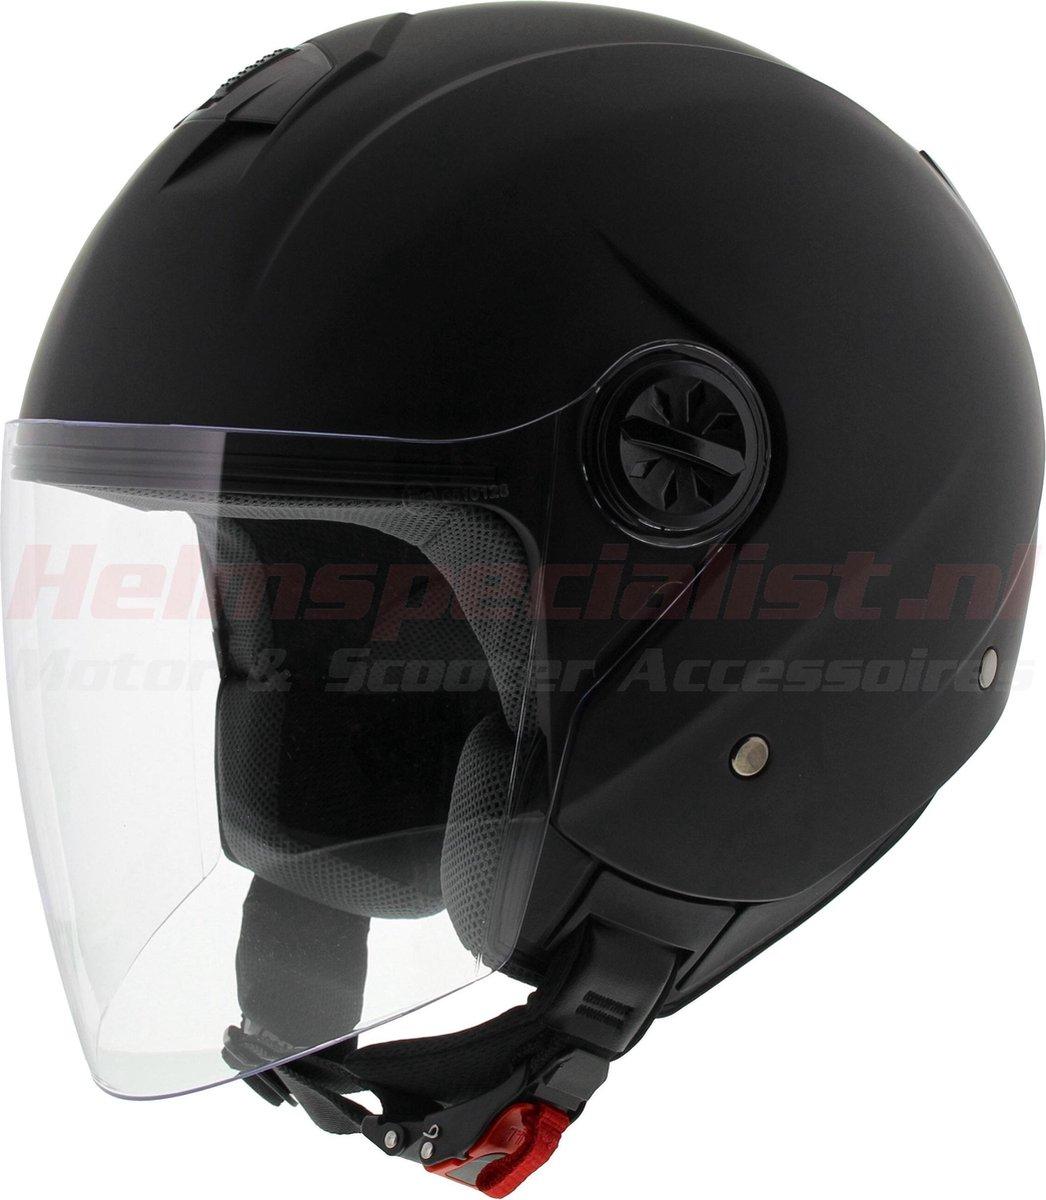 Vito JET Palermo Mat Zwart Jethelm - Motorhelm - Maat XL